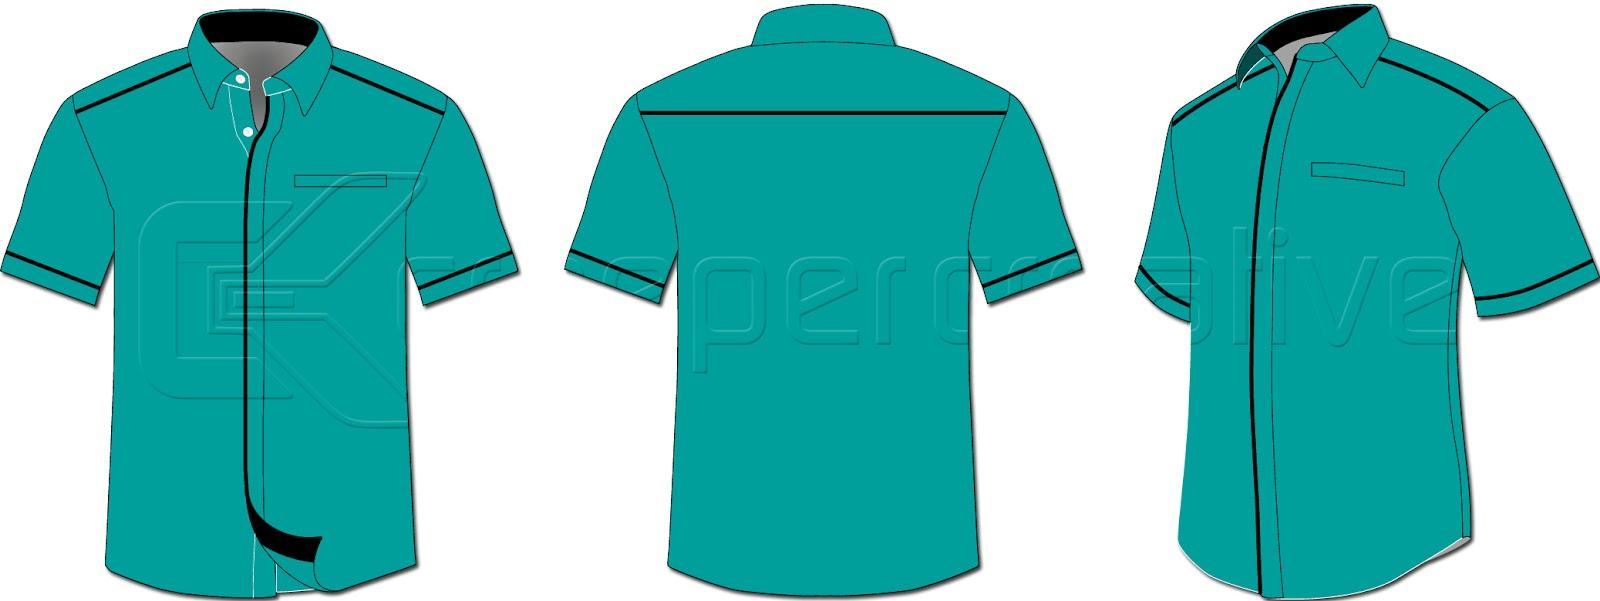 Corporate T Shirt Design Vector